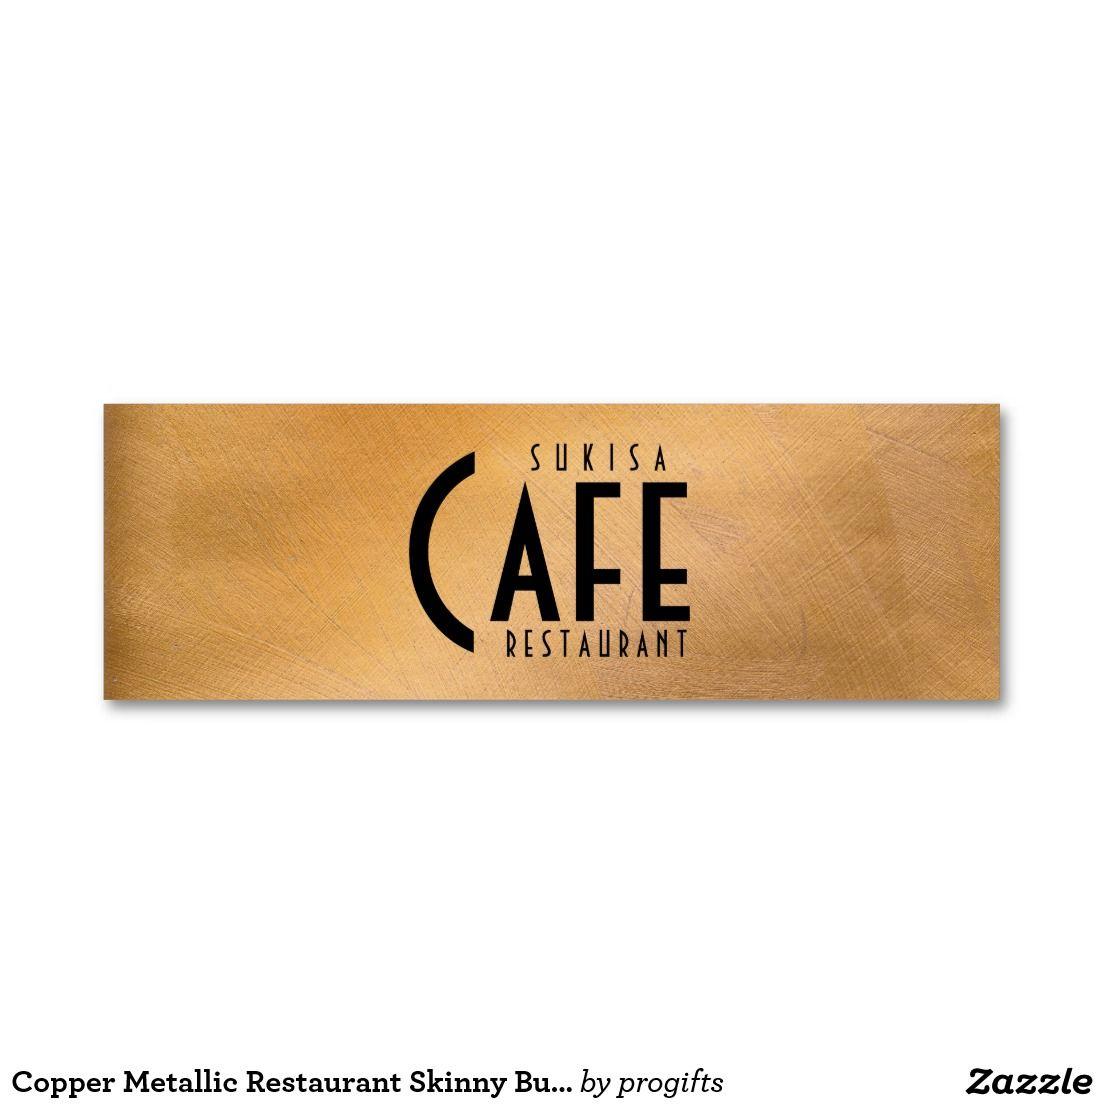 copper metallic restaurant skinny business card   copper